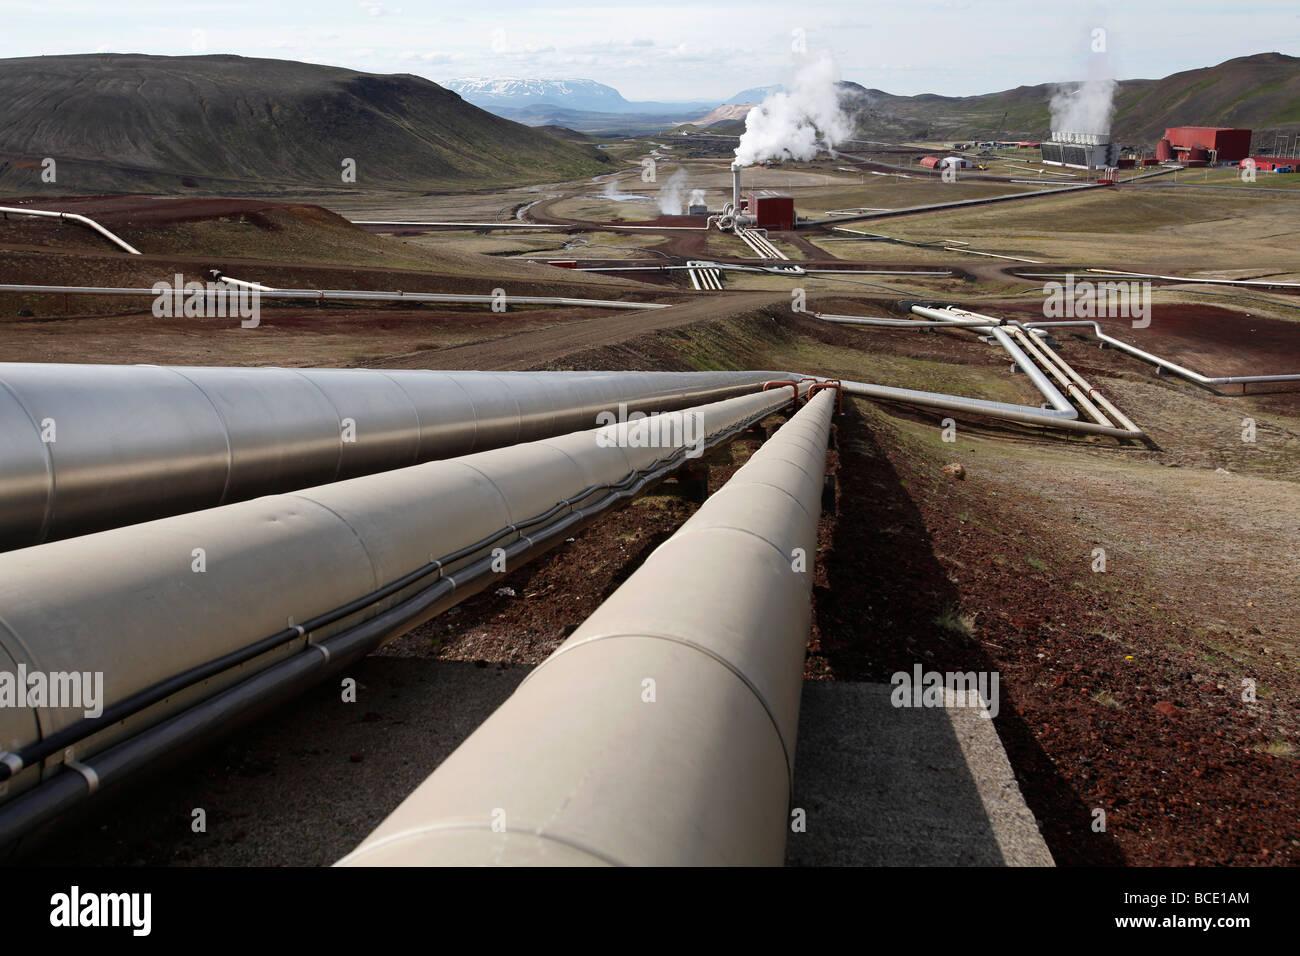 Krafla Power Stockfotos & Krafla Power Bilder - Seite 8 - Alamy